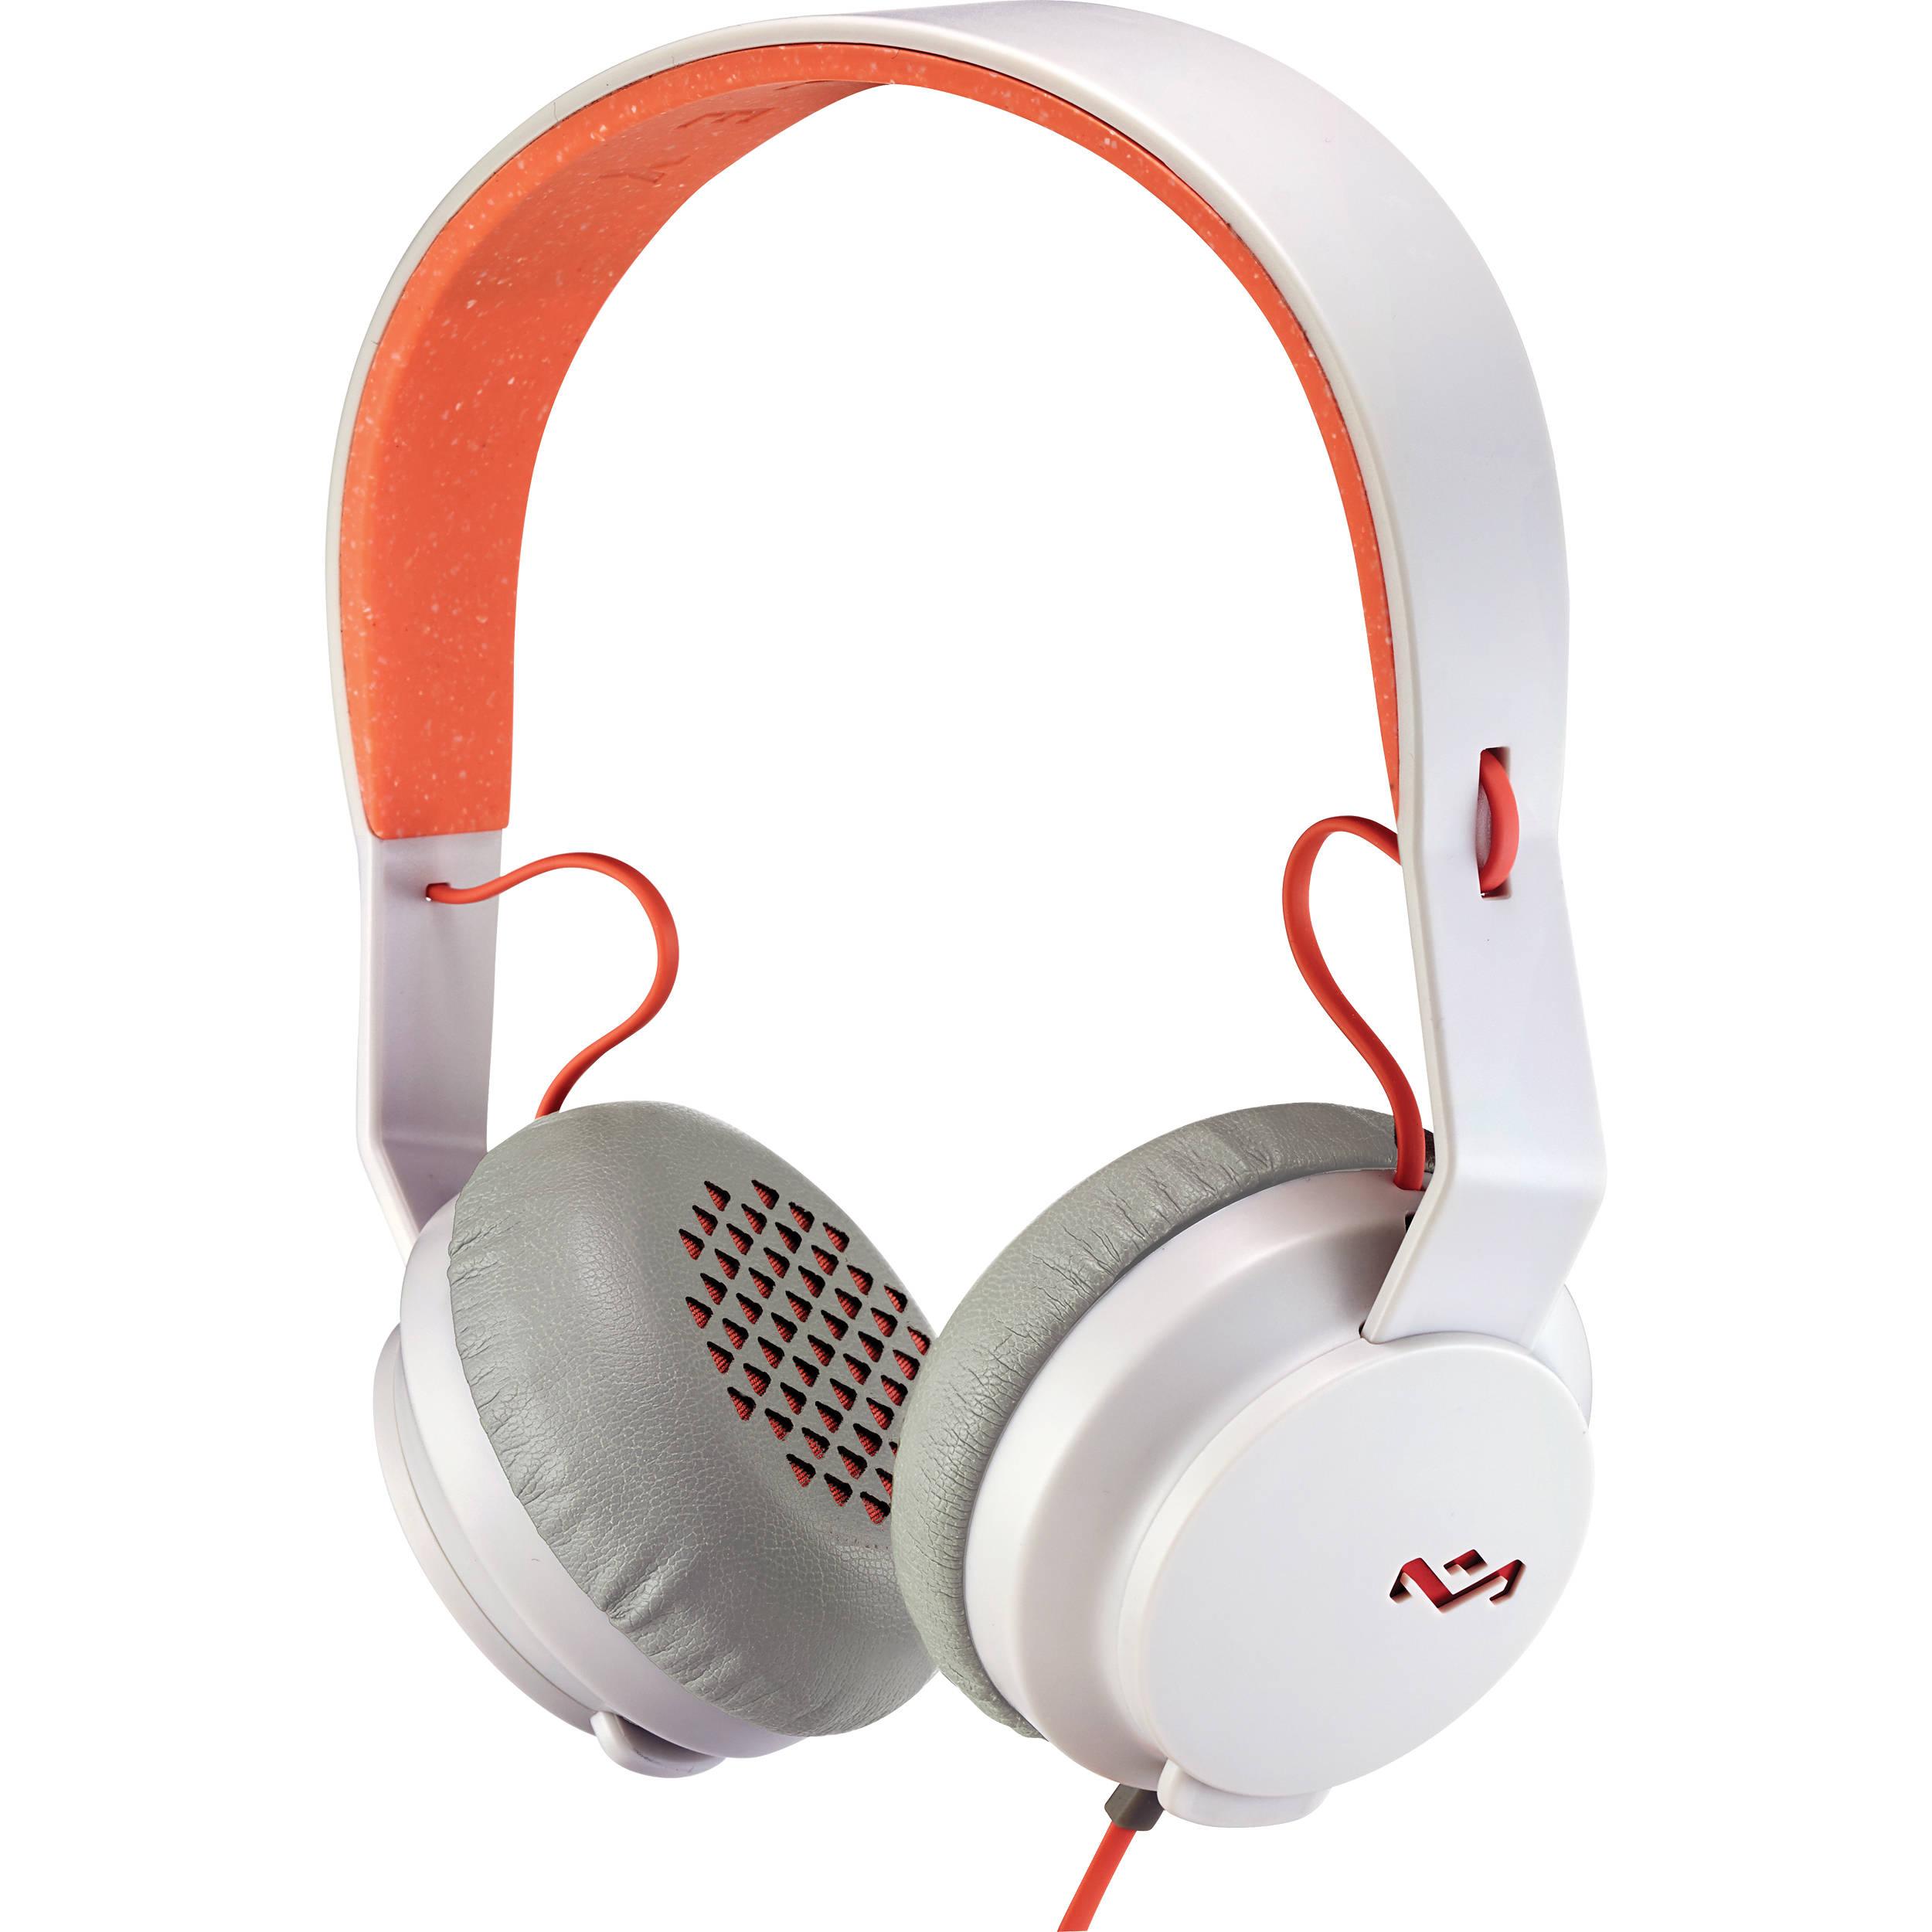 House of Marley EM-JH081 Rebel On-Ear Headphones (Peach)